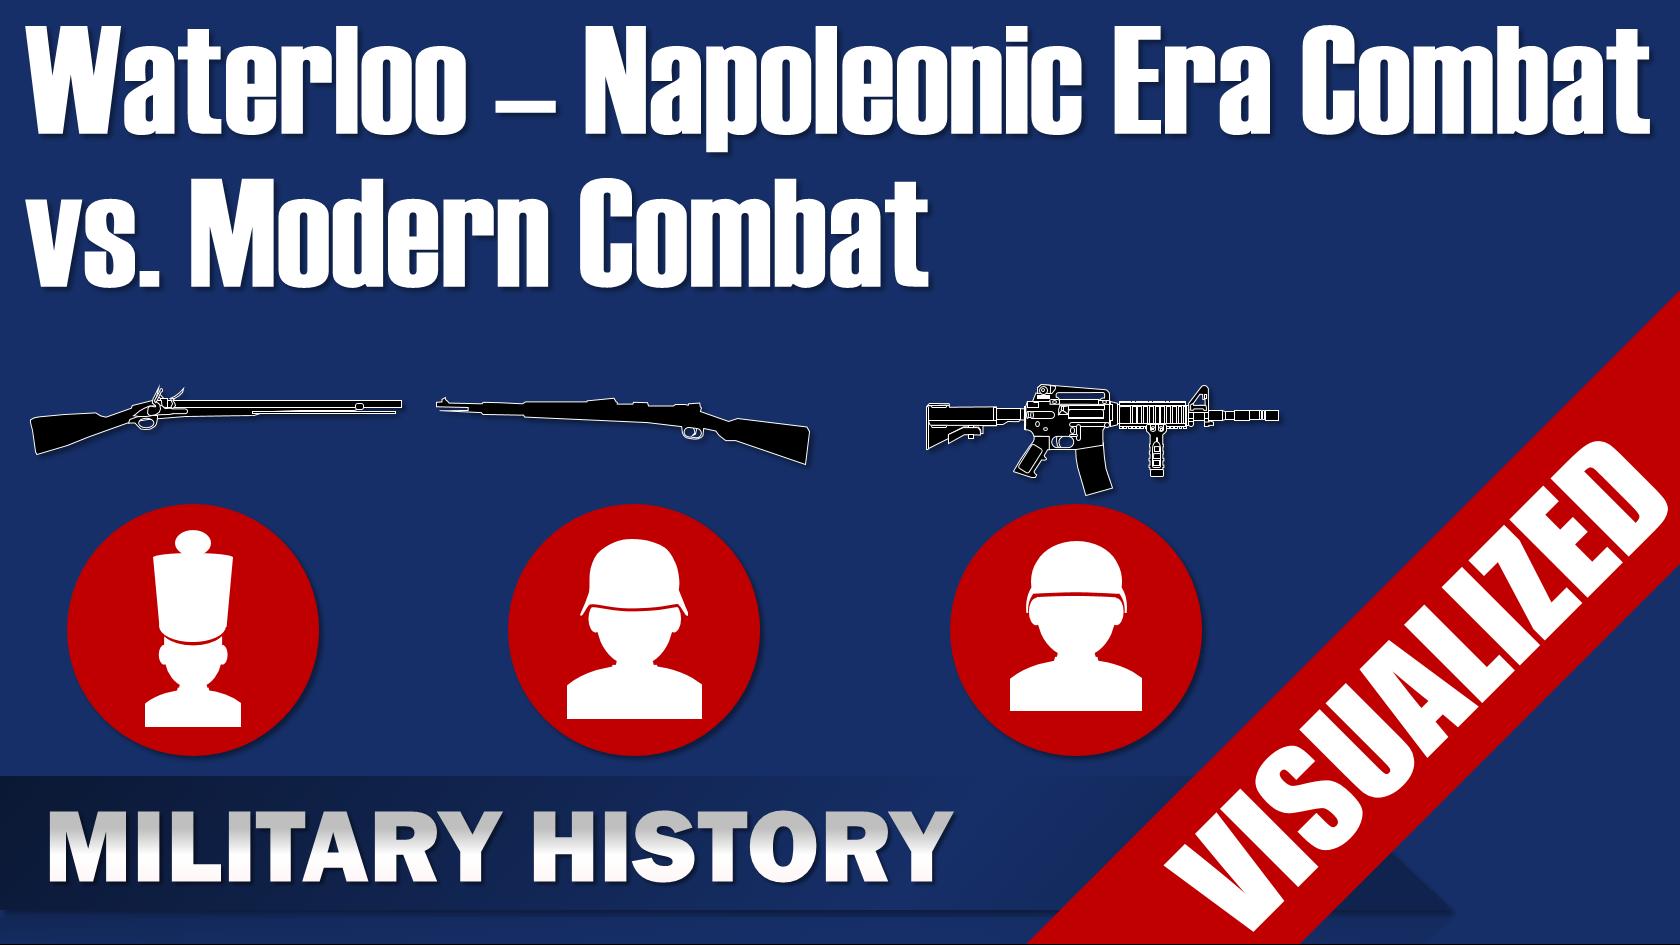 Waterloo Napoleonic Era Combat Vs Modern Combat